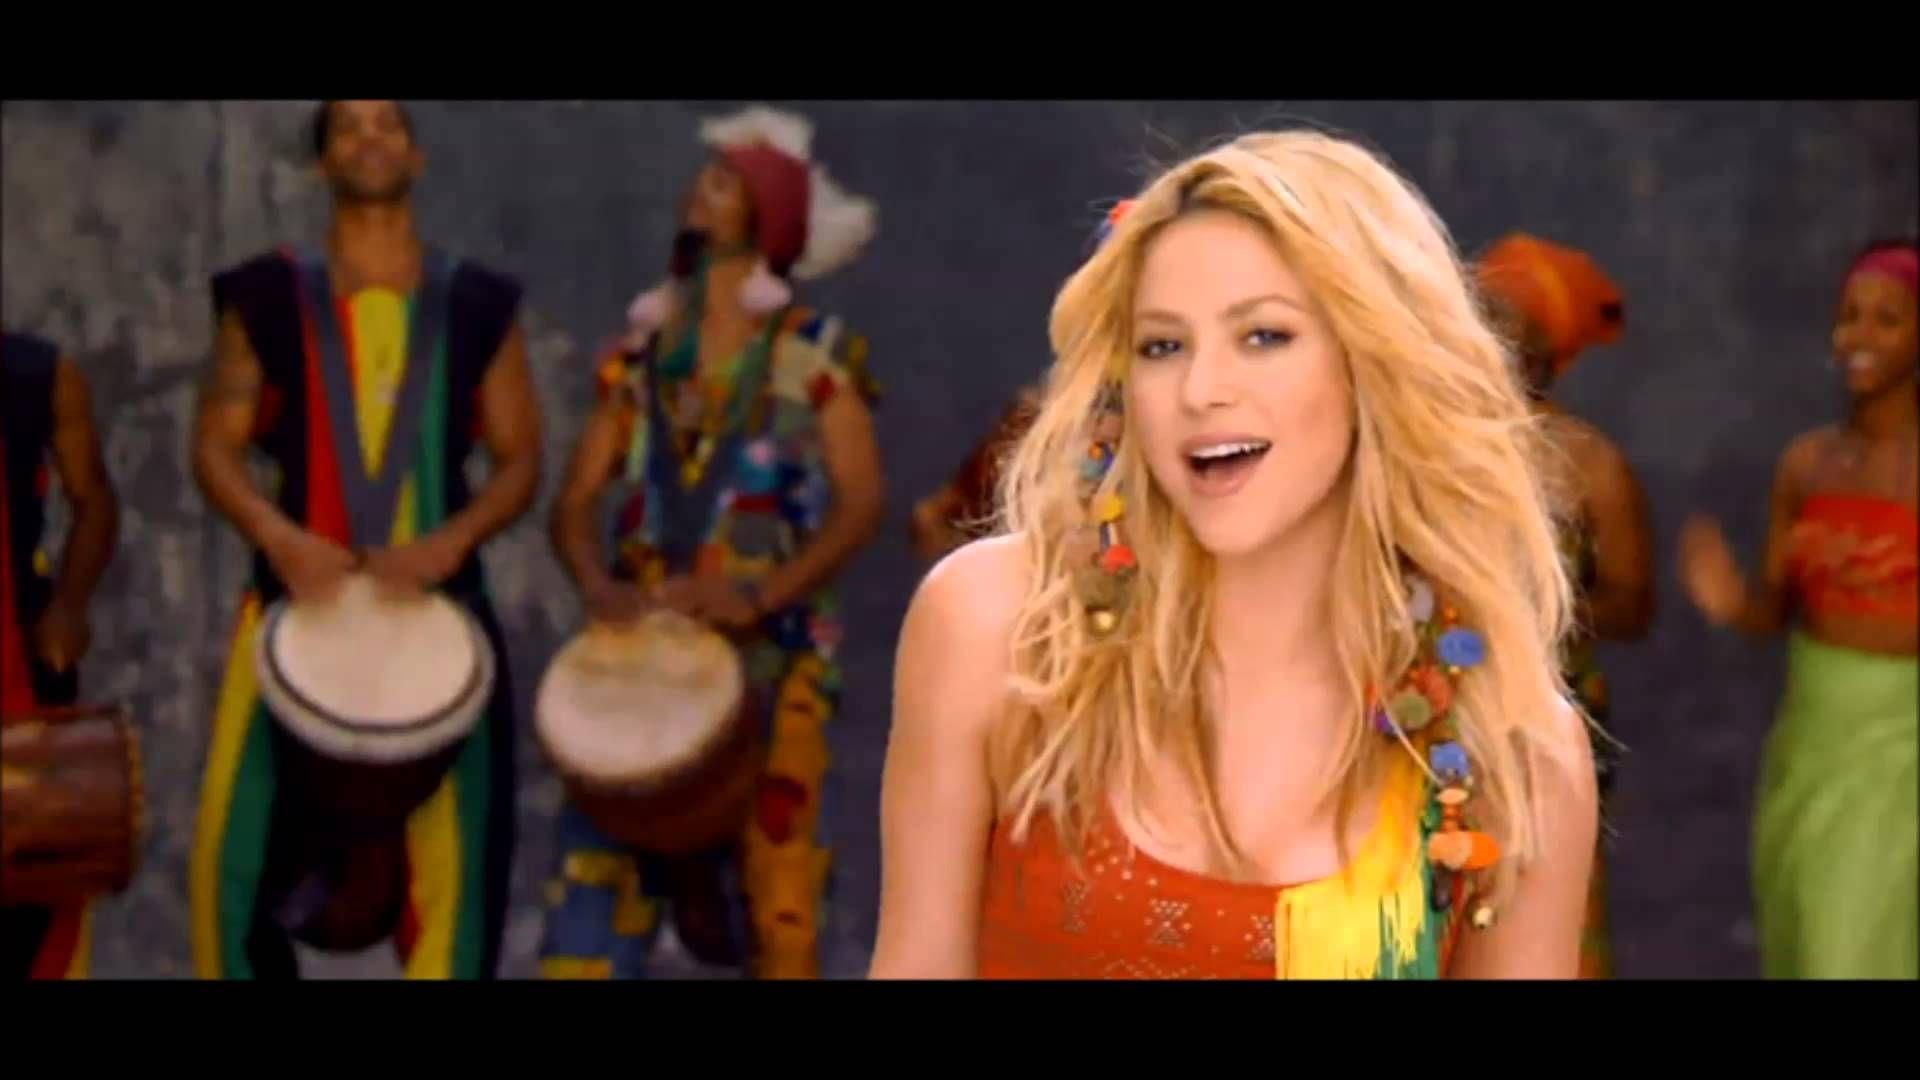 Shakira La La La Lyrics Com Carlinhos Brown Musica Da Copa 2014 Fifa Shakira Melhores Musicas Musica